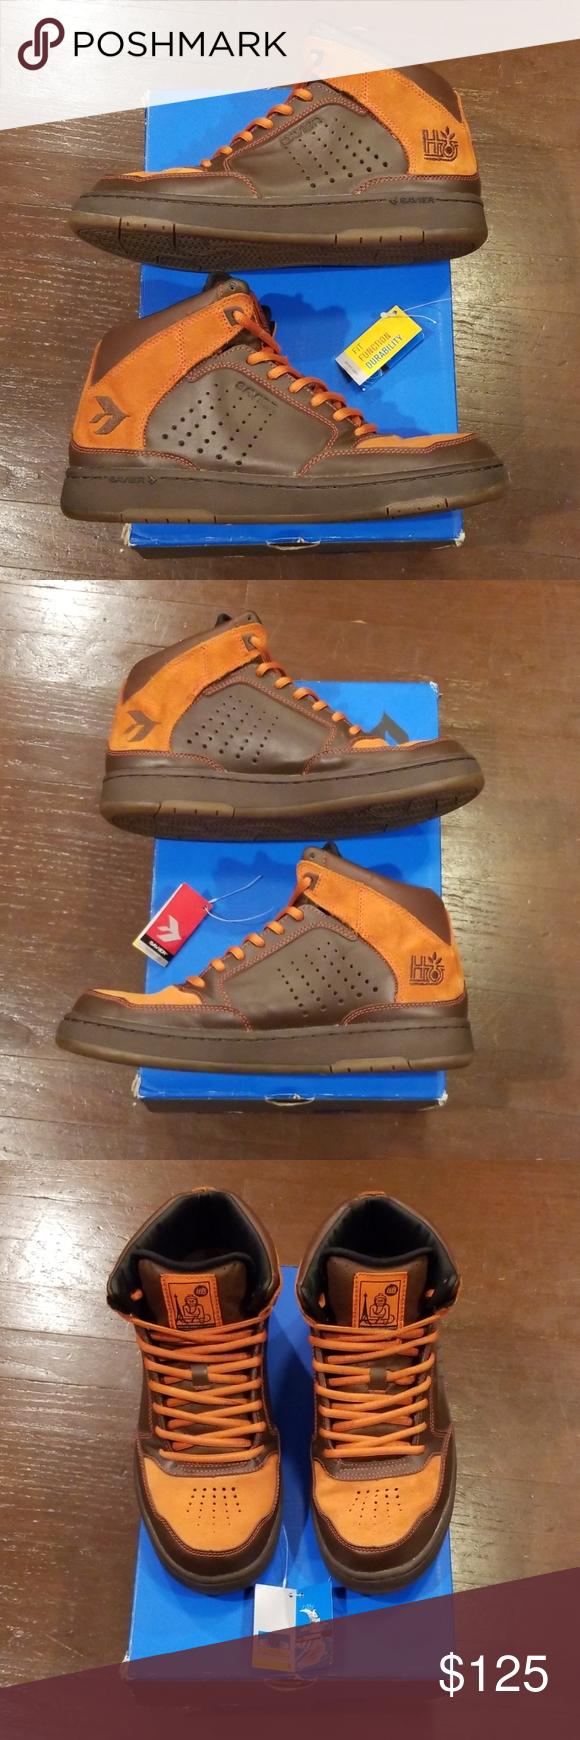 Savier Fulton X Habitat Series Orange Brown 9 In 2020 Fulton Slip On Sandal Leather